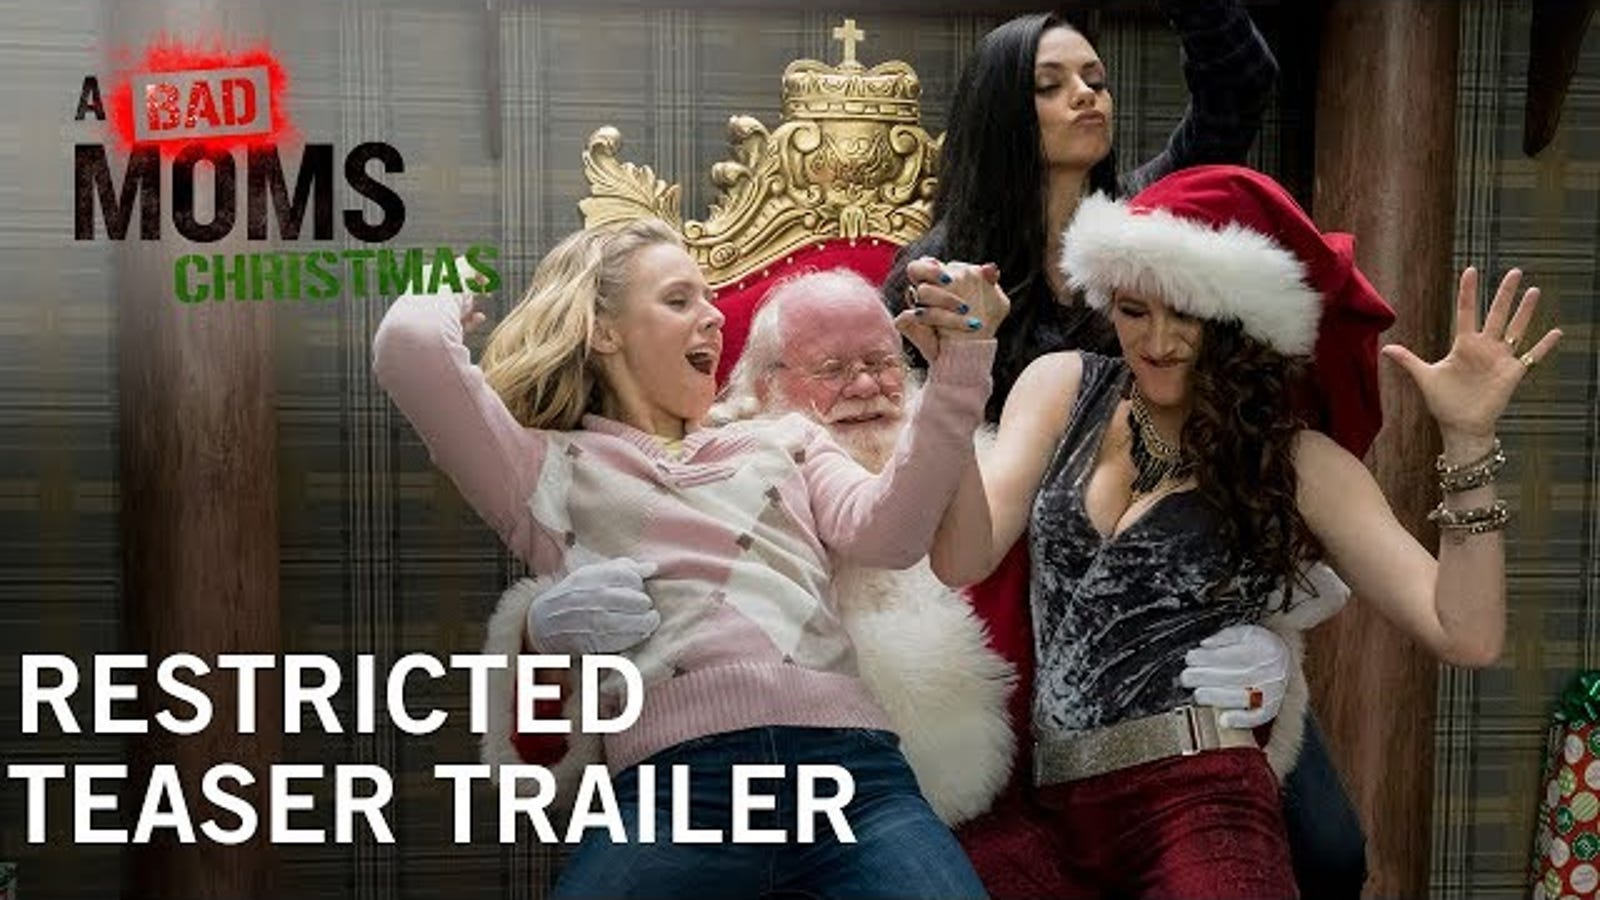 trailer for A Bad Moms